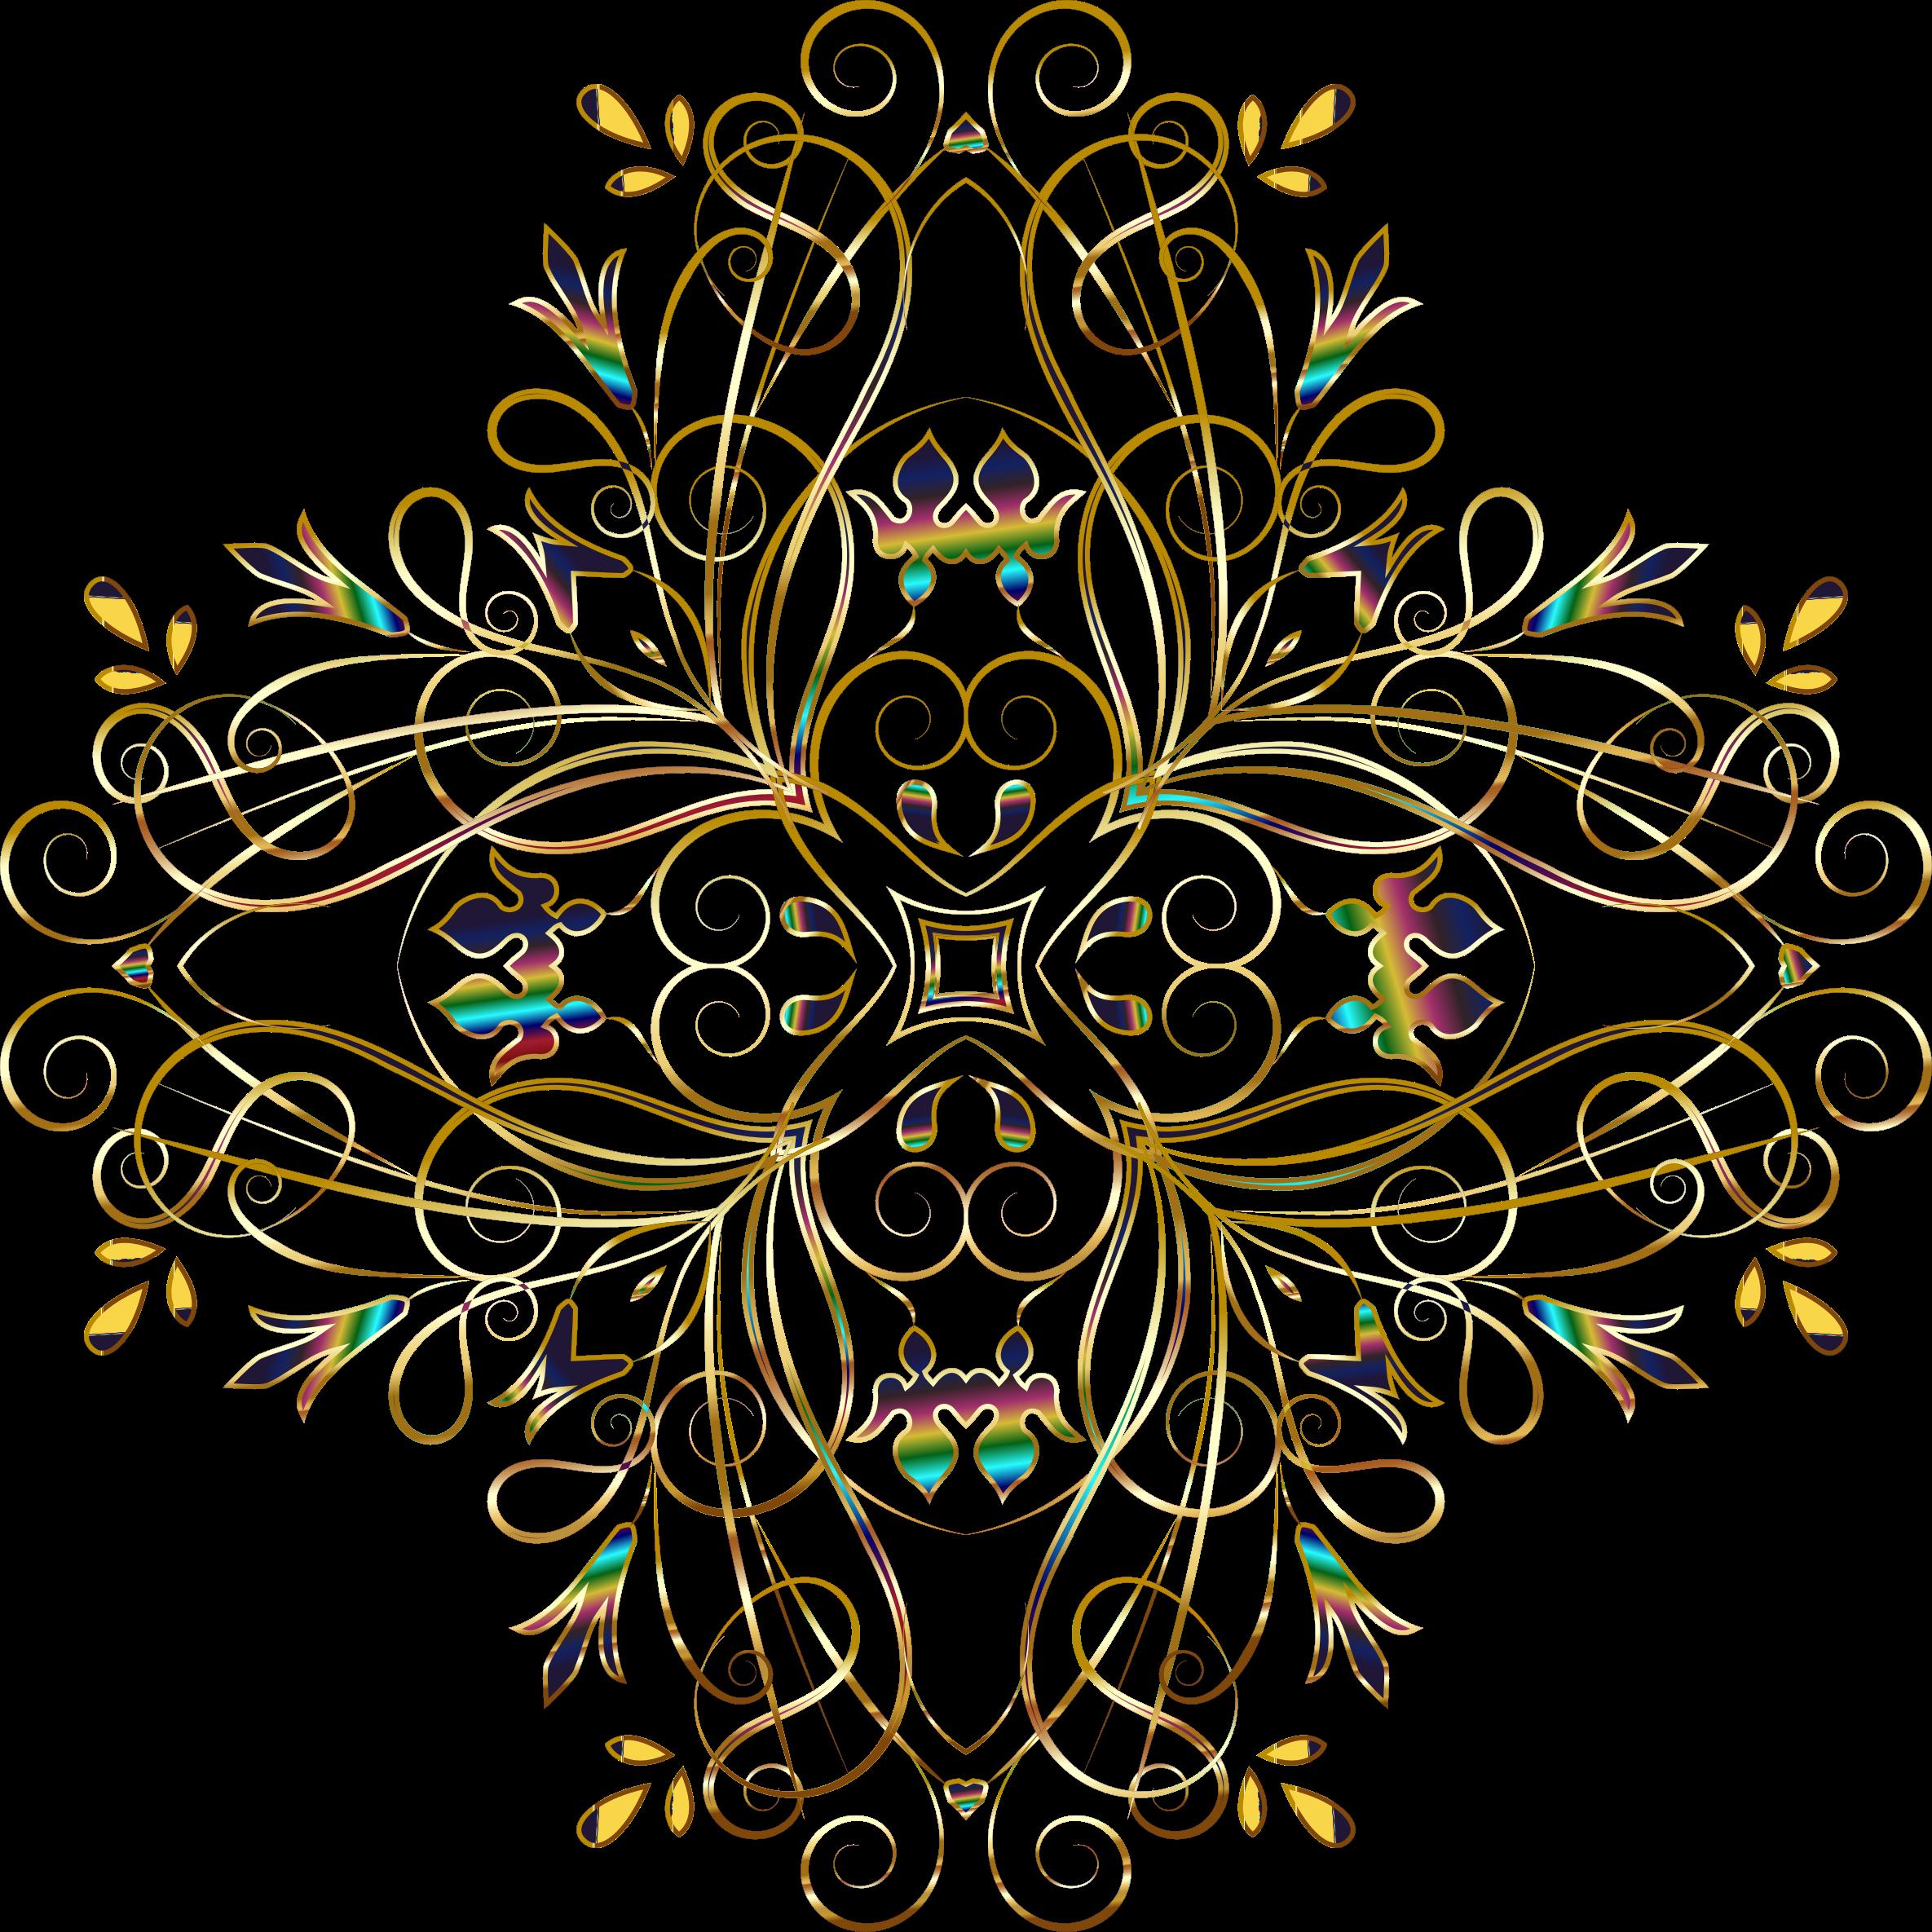 Design clipart background. Flourishy floral variation no